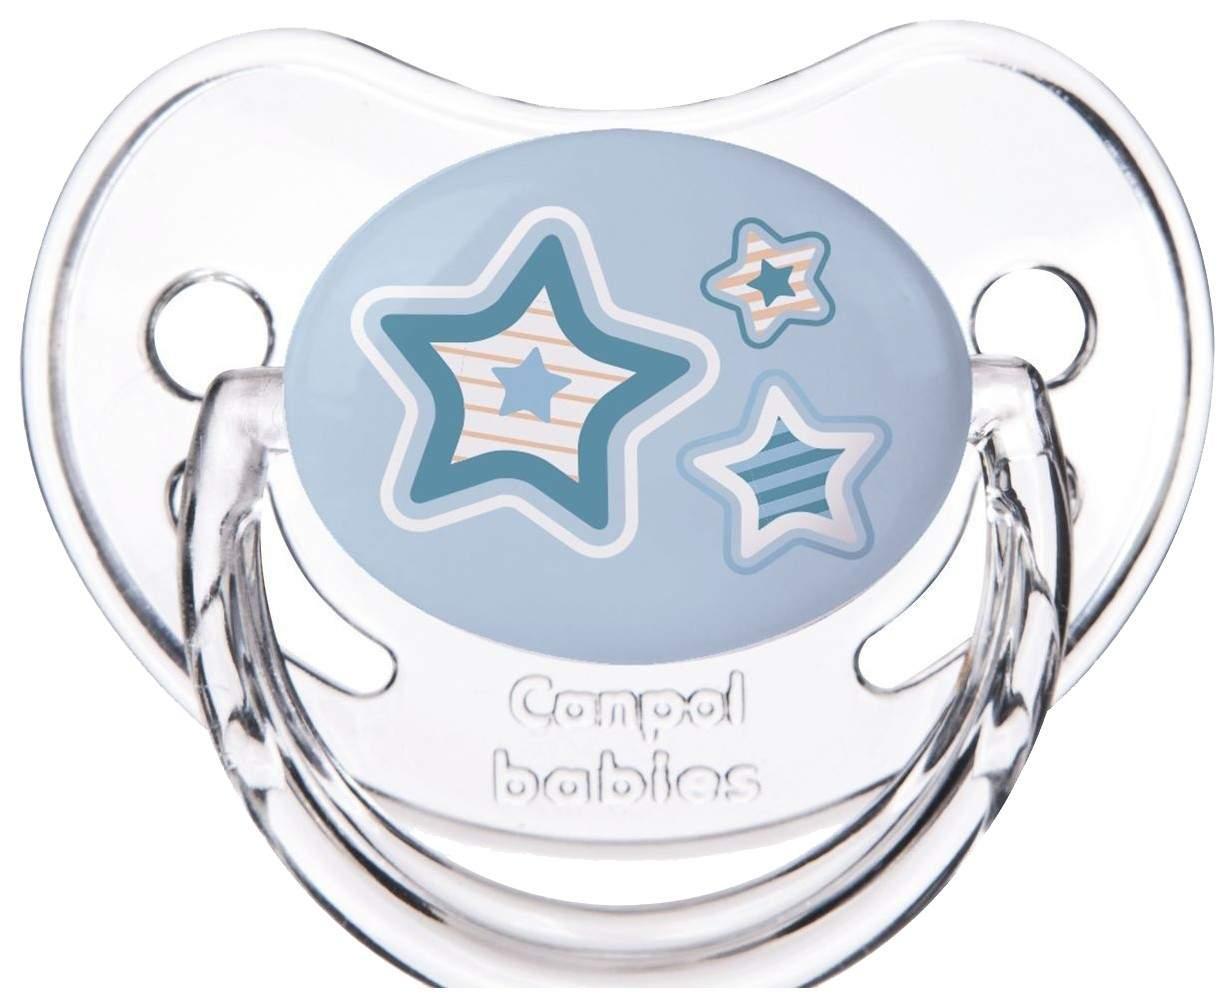 Пустышка Canpol Newborn baby симметричная, силикон, 0-6 мес., арт. 22/580 цвет голубой